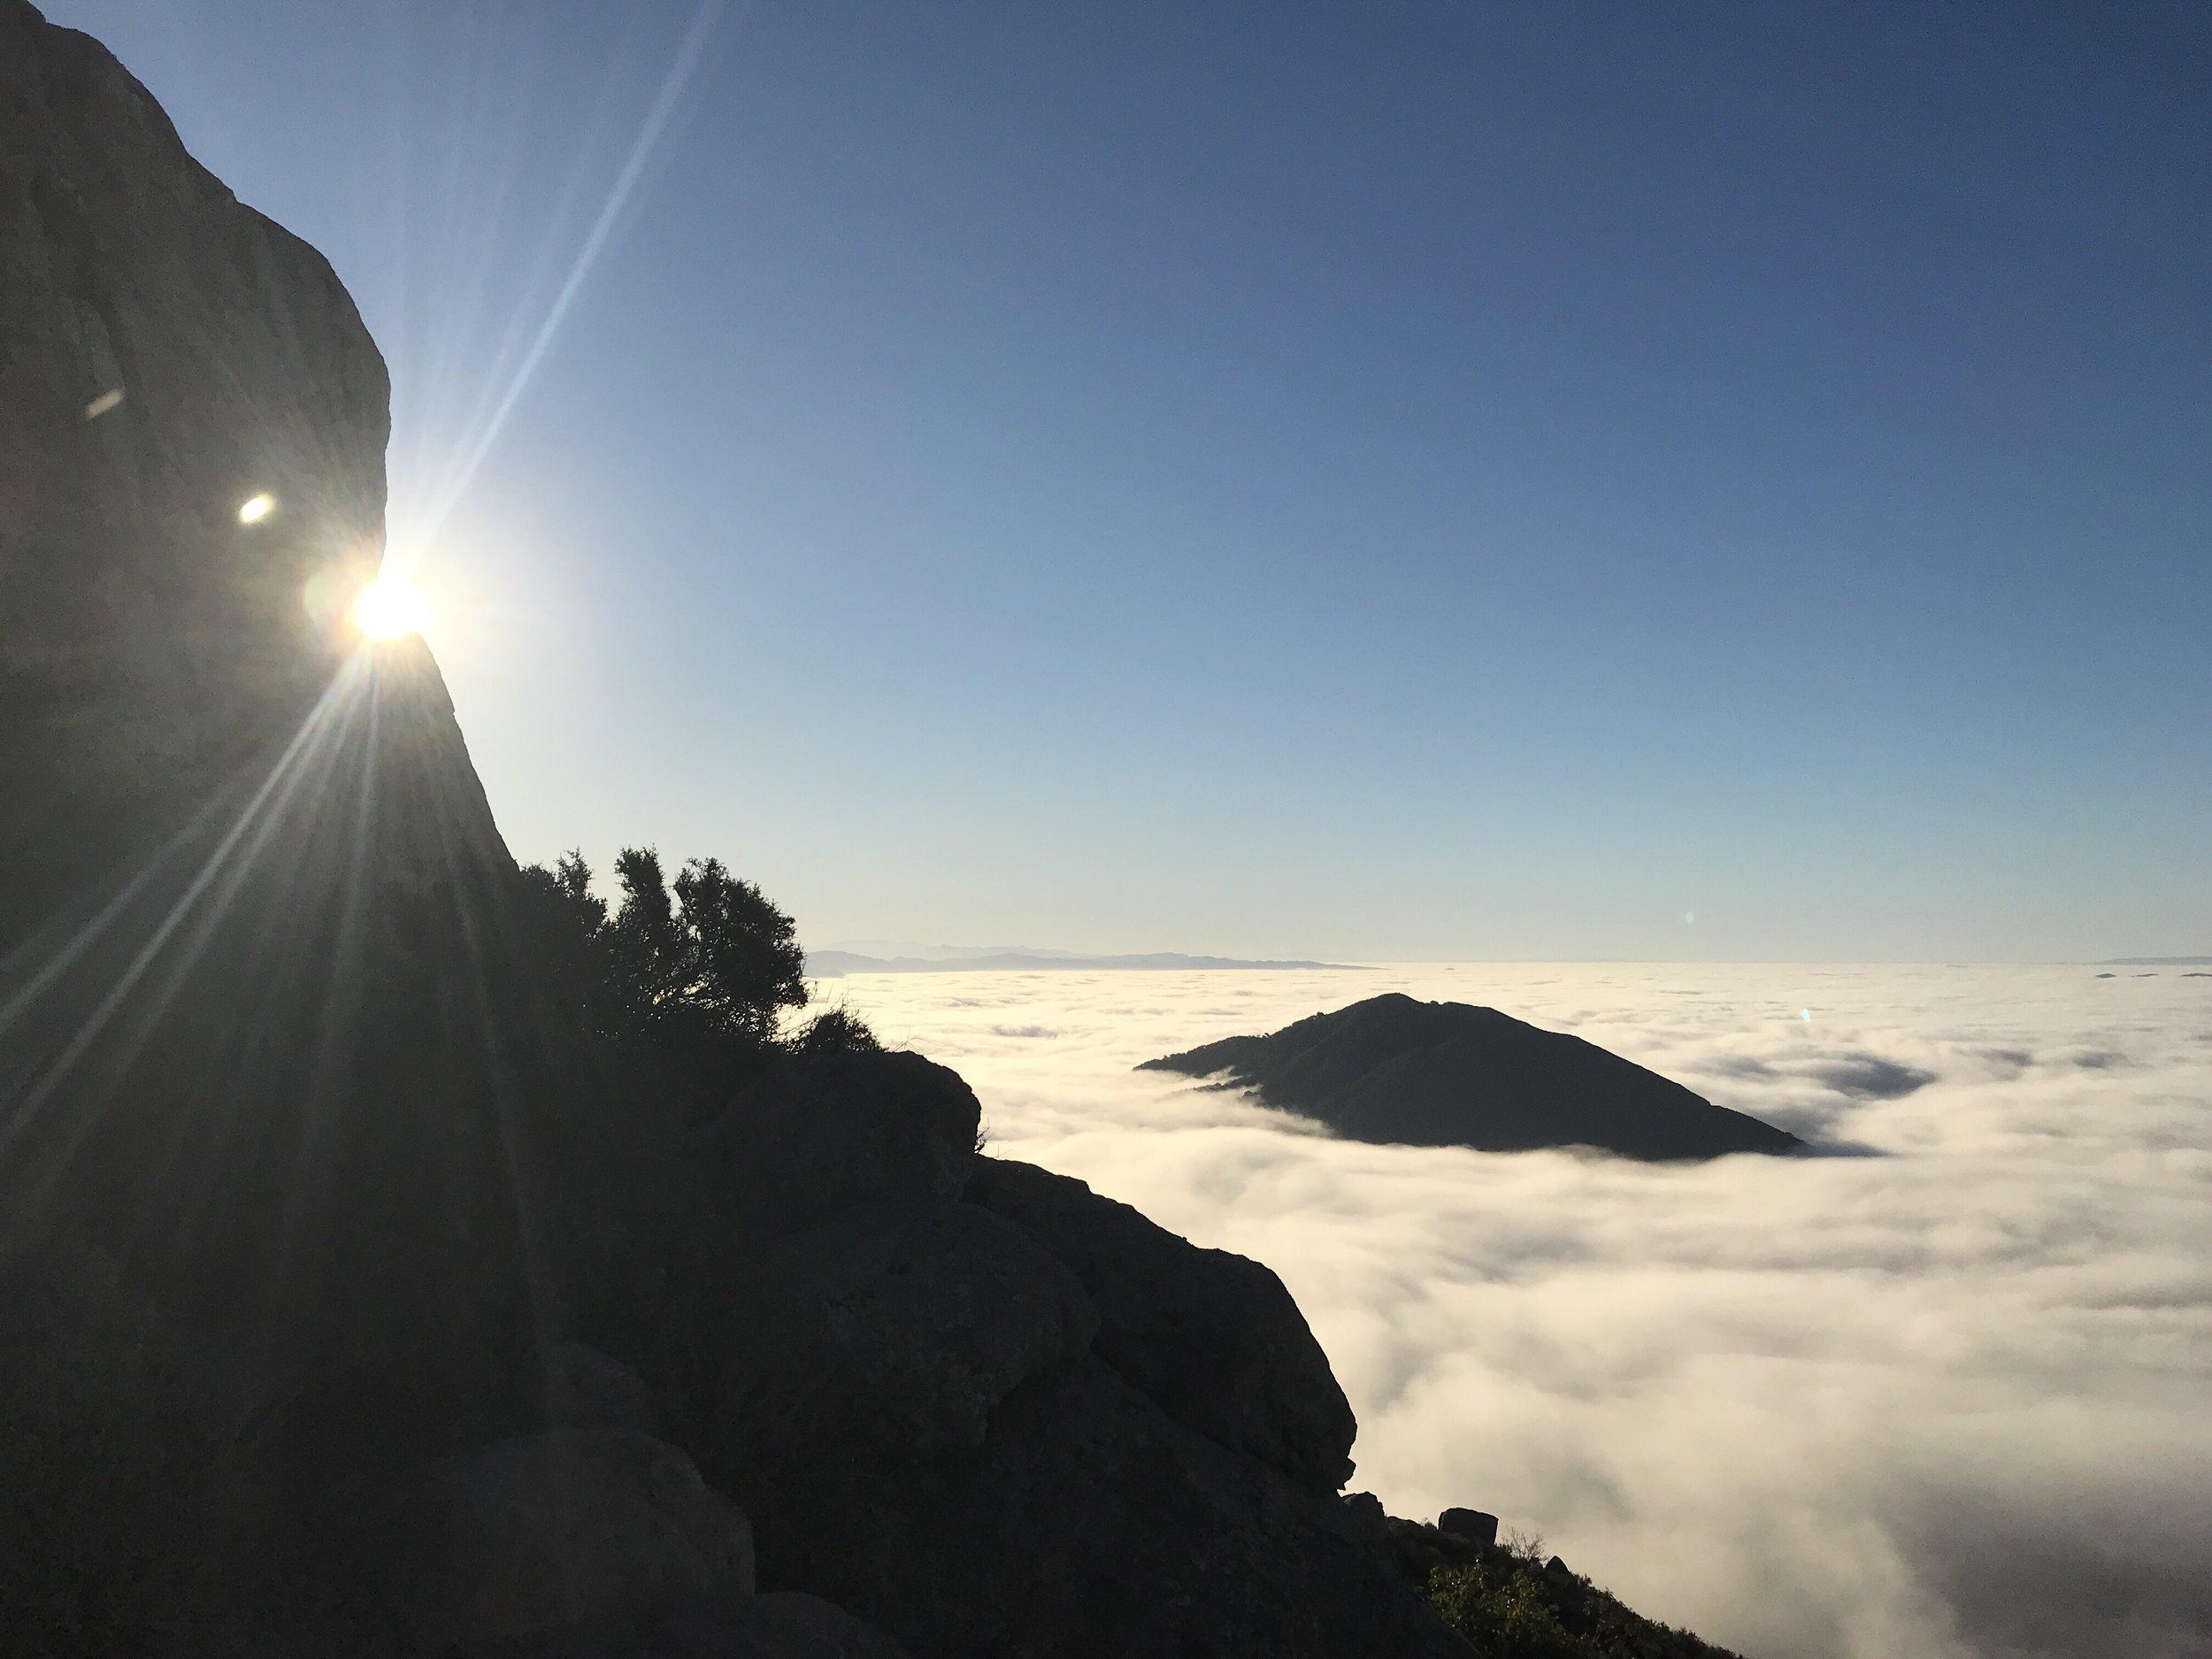 Views from the Peak, looking out towards Cerro San Luis Obispo.